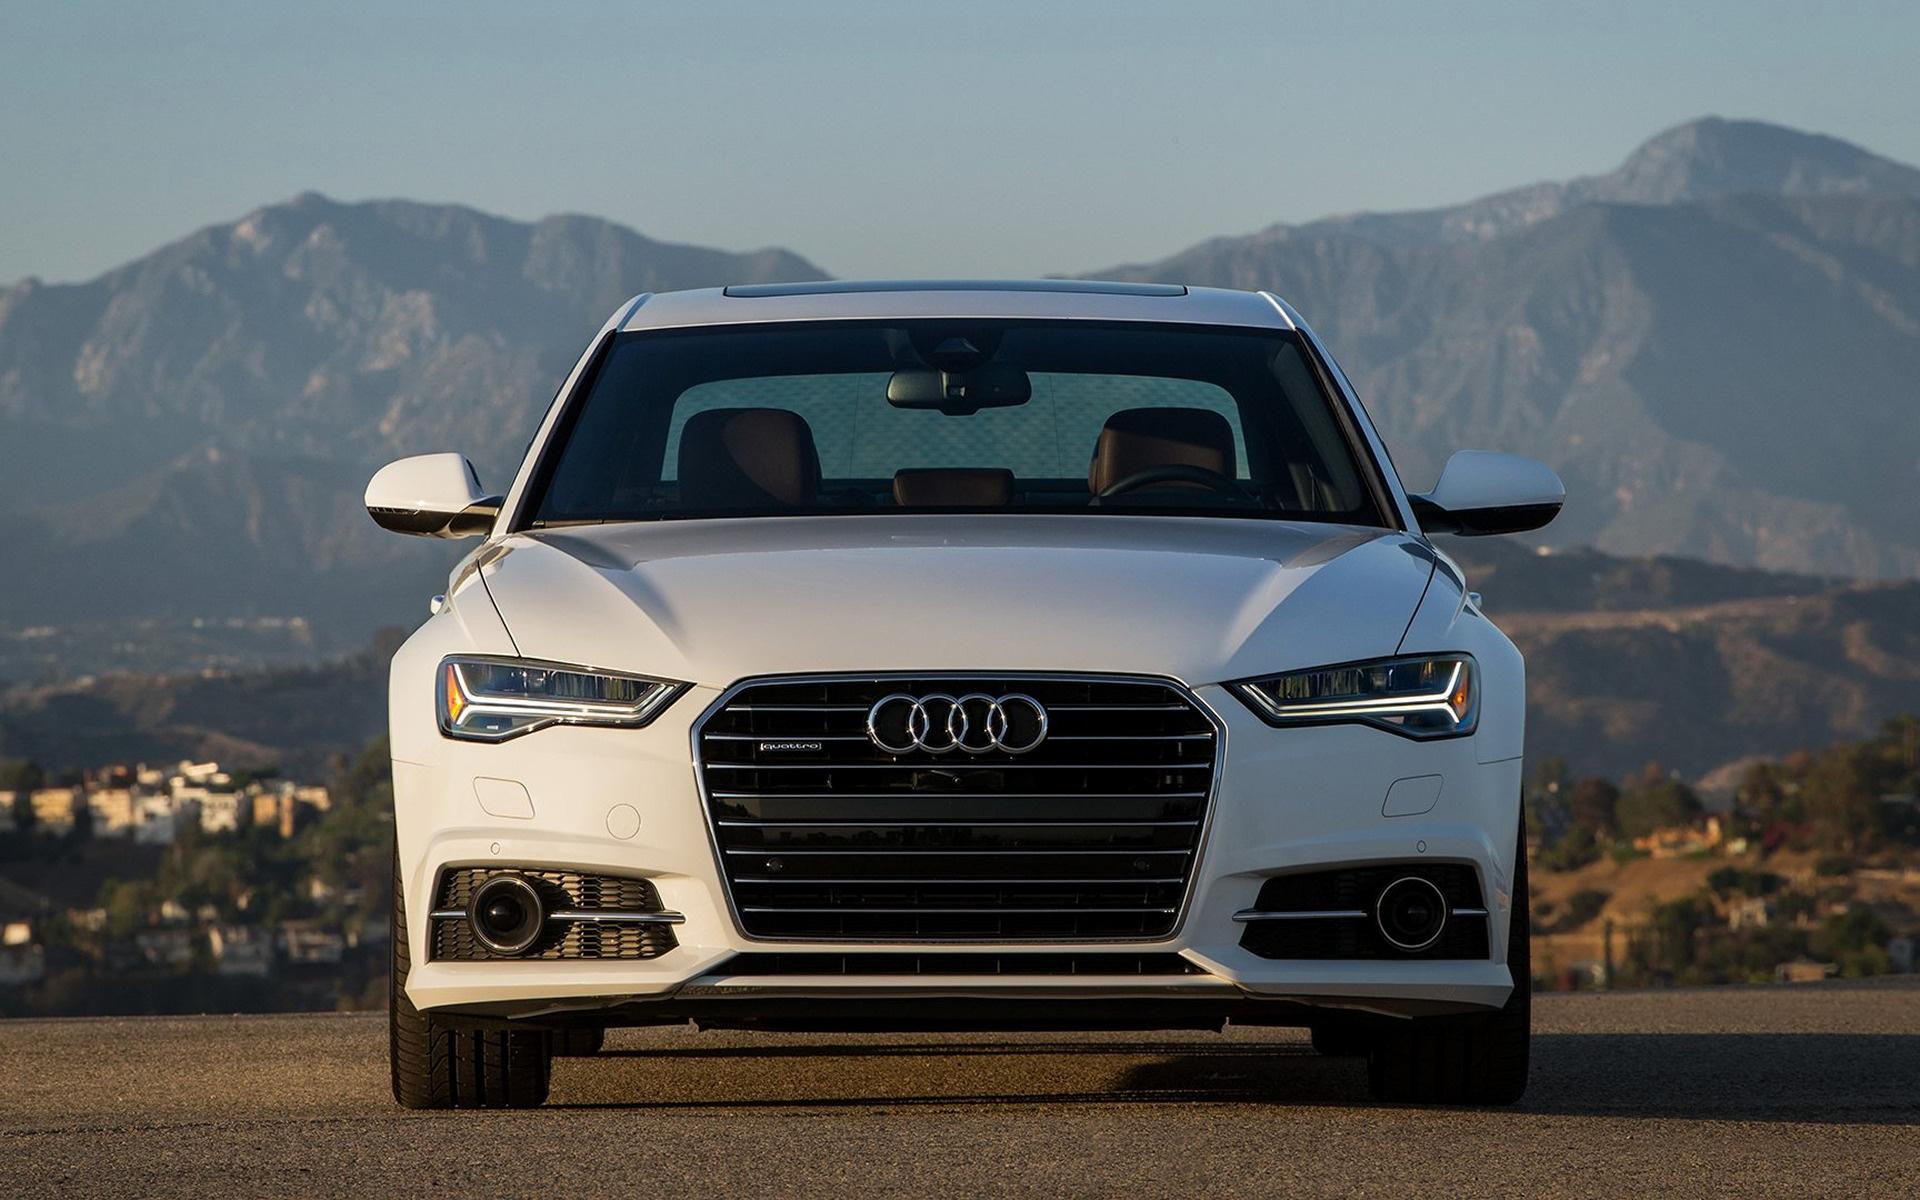 audi-a-sedan-Audi-A-Sedan-S-Line-Us-And-Hd-Images-for-Audi-A-Sedan-wallpaper-wp3402669